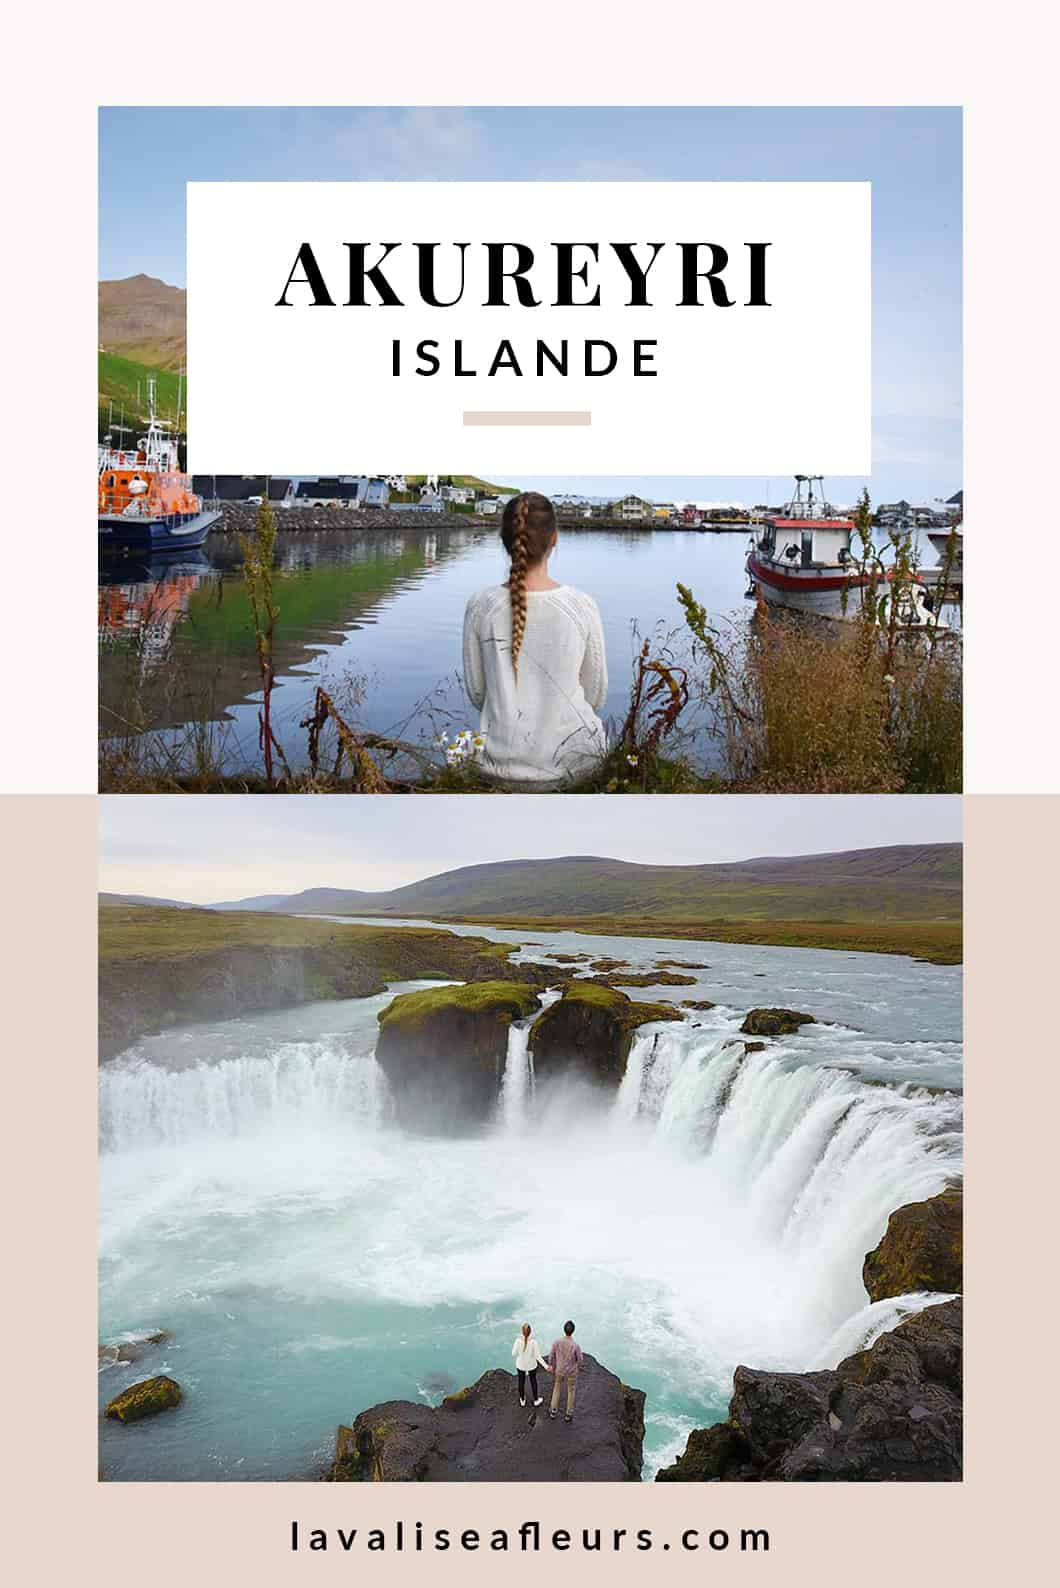 Visiter Akureyri au nord de l'Islande